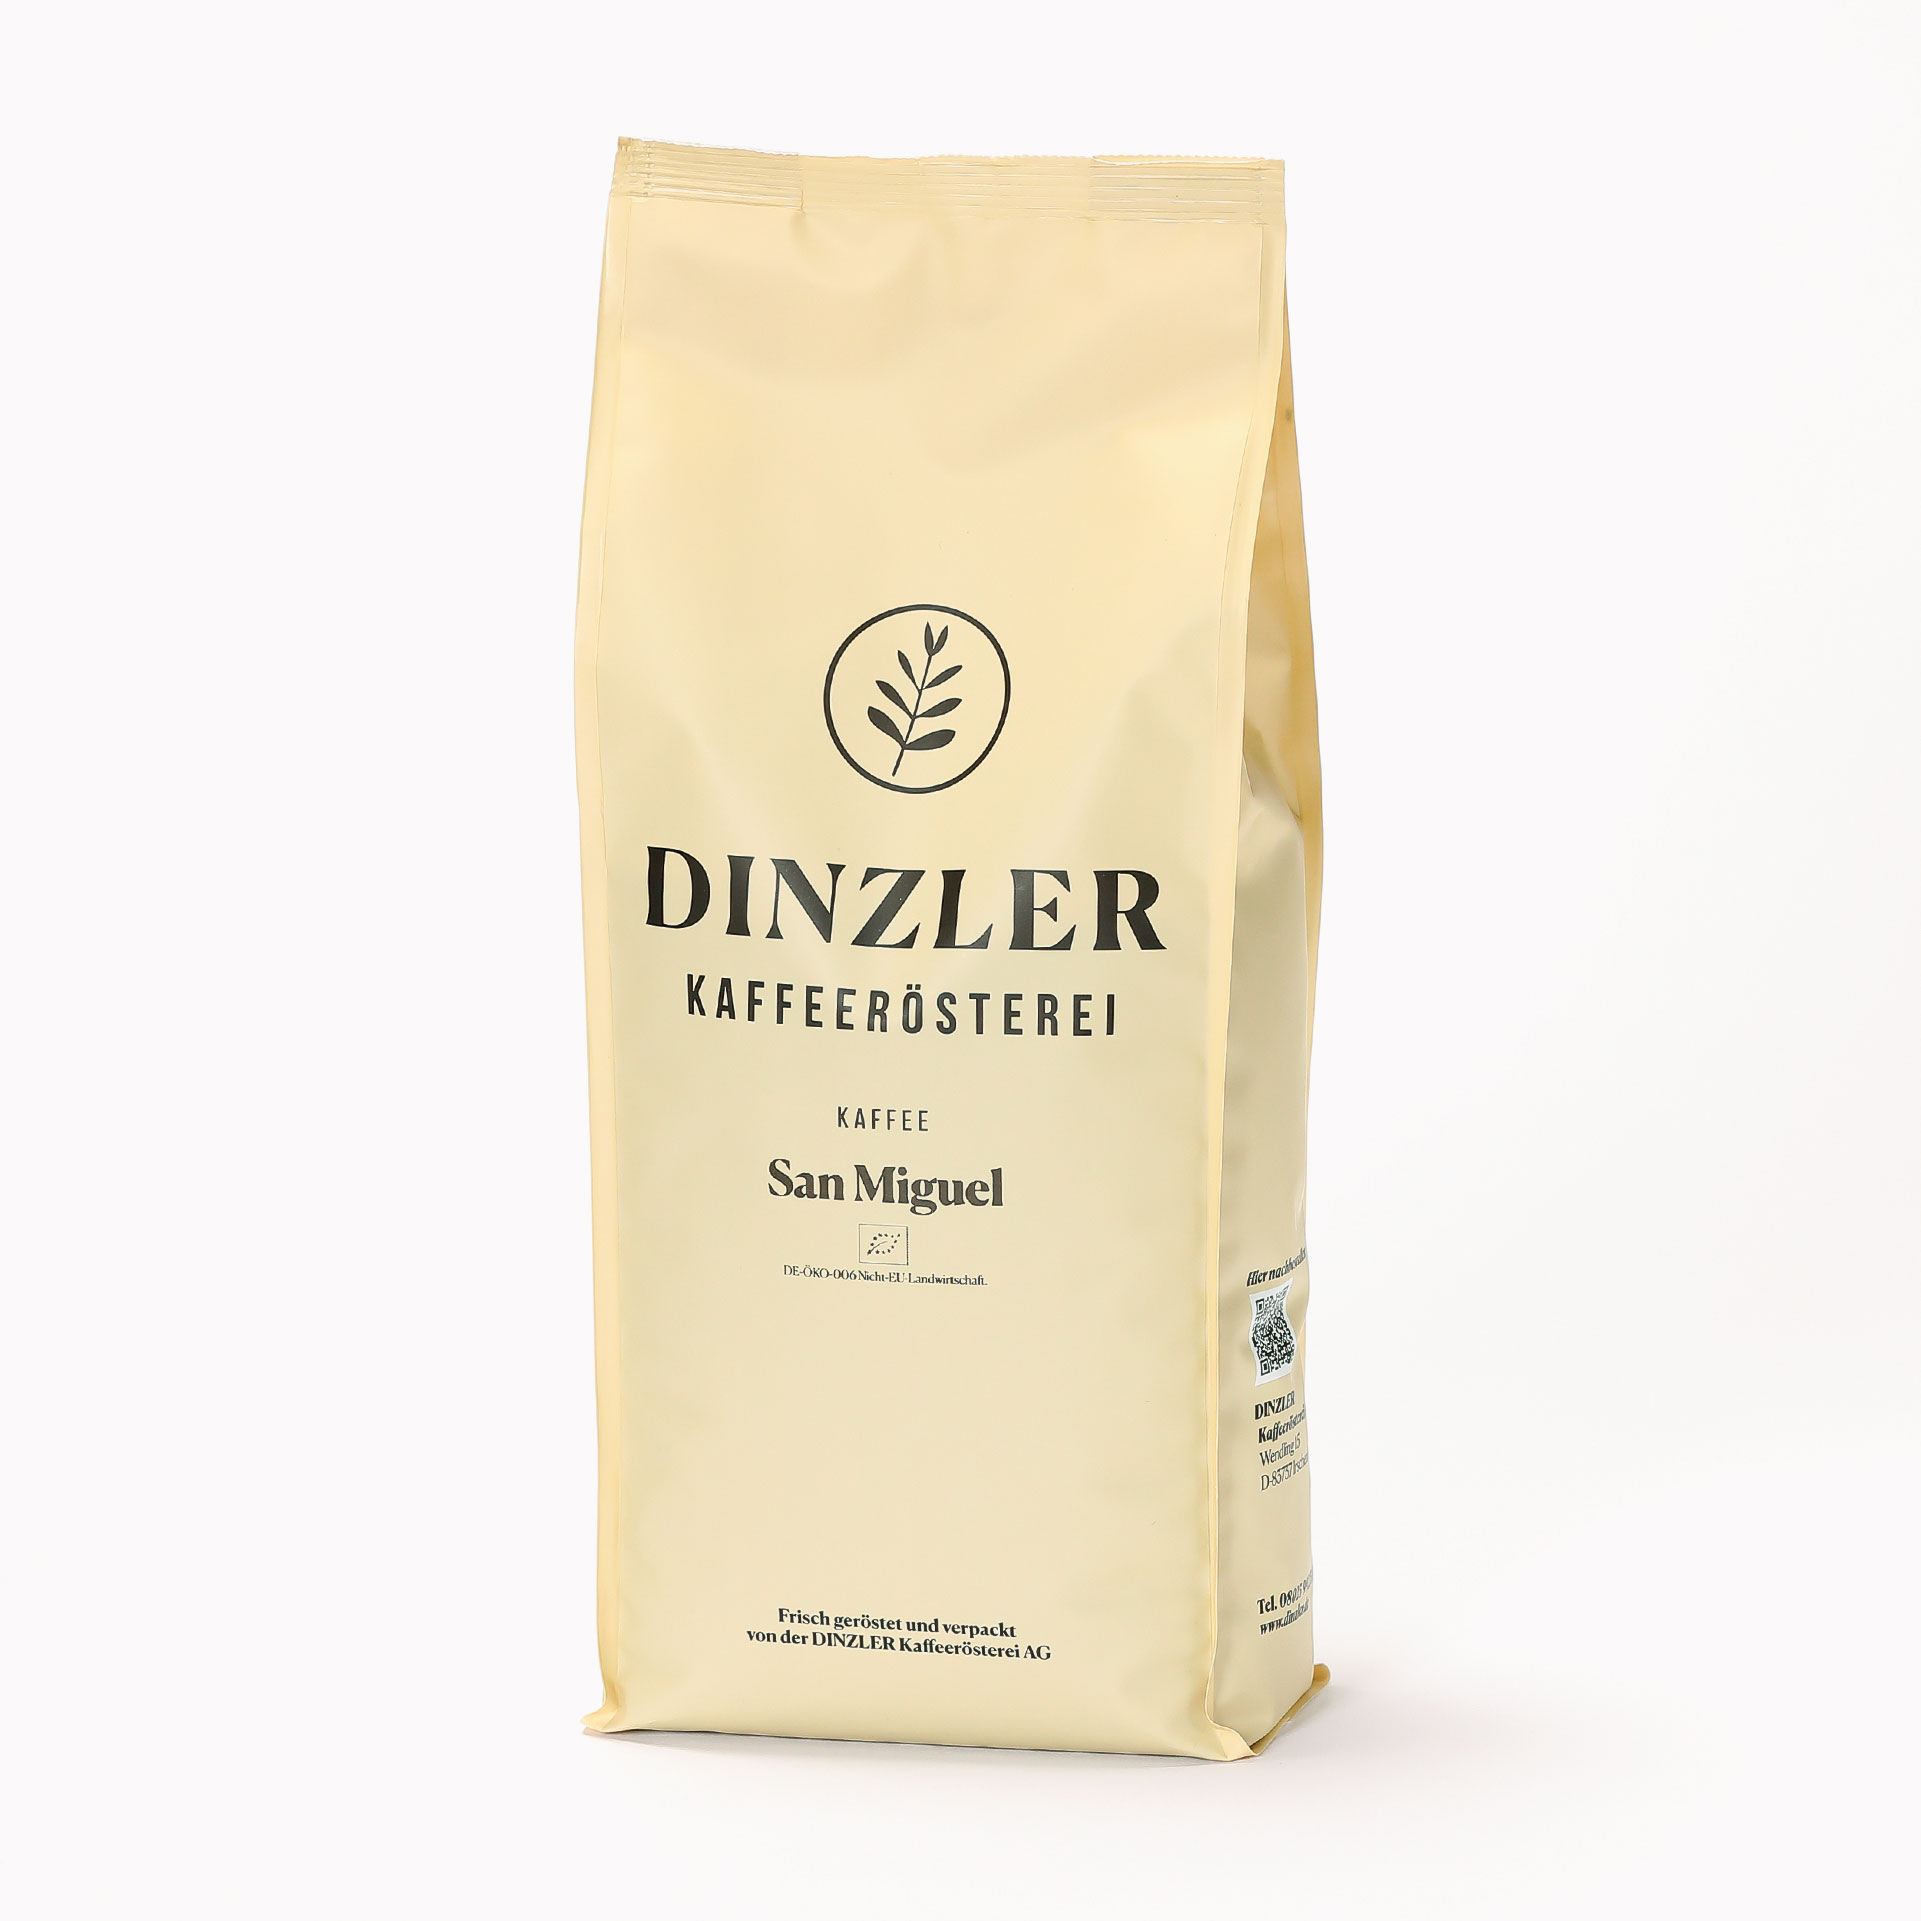 DINZLER Kaffee San Miguel